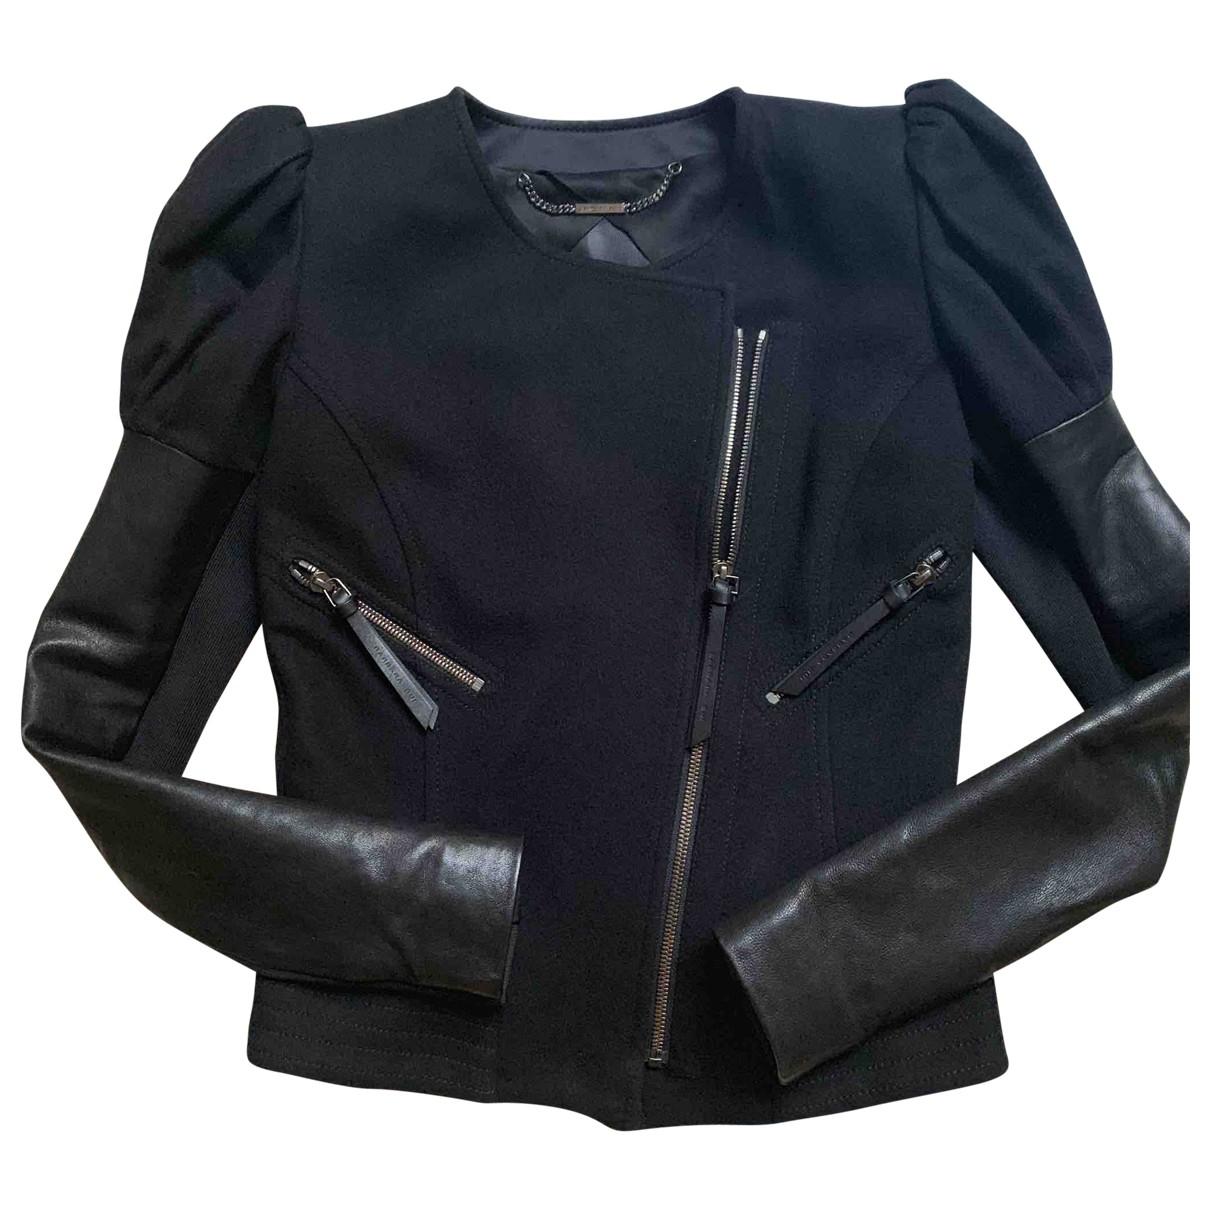 Barbara Bui \N Black Wool jacket for Women XS International